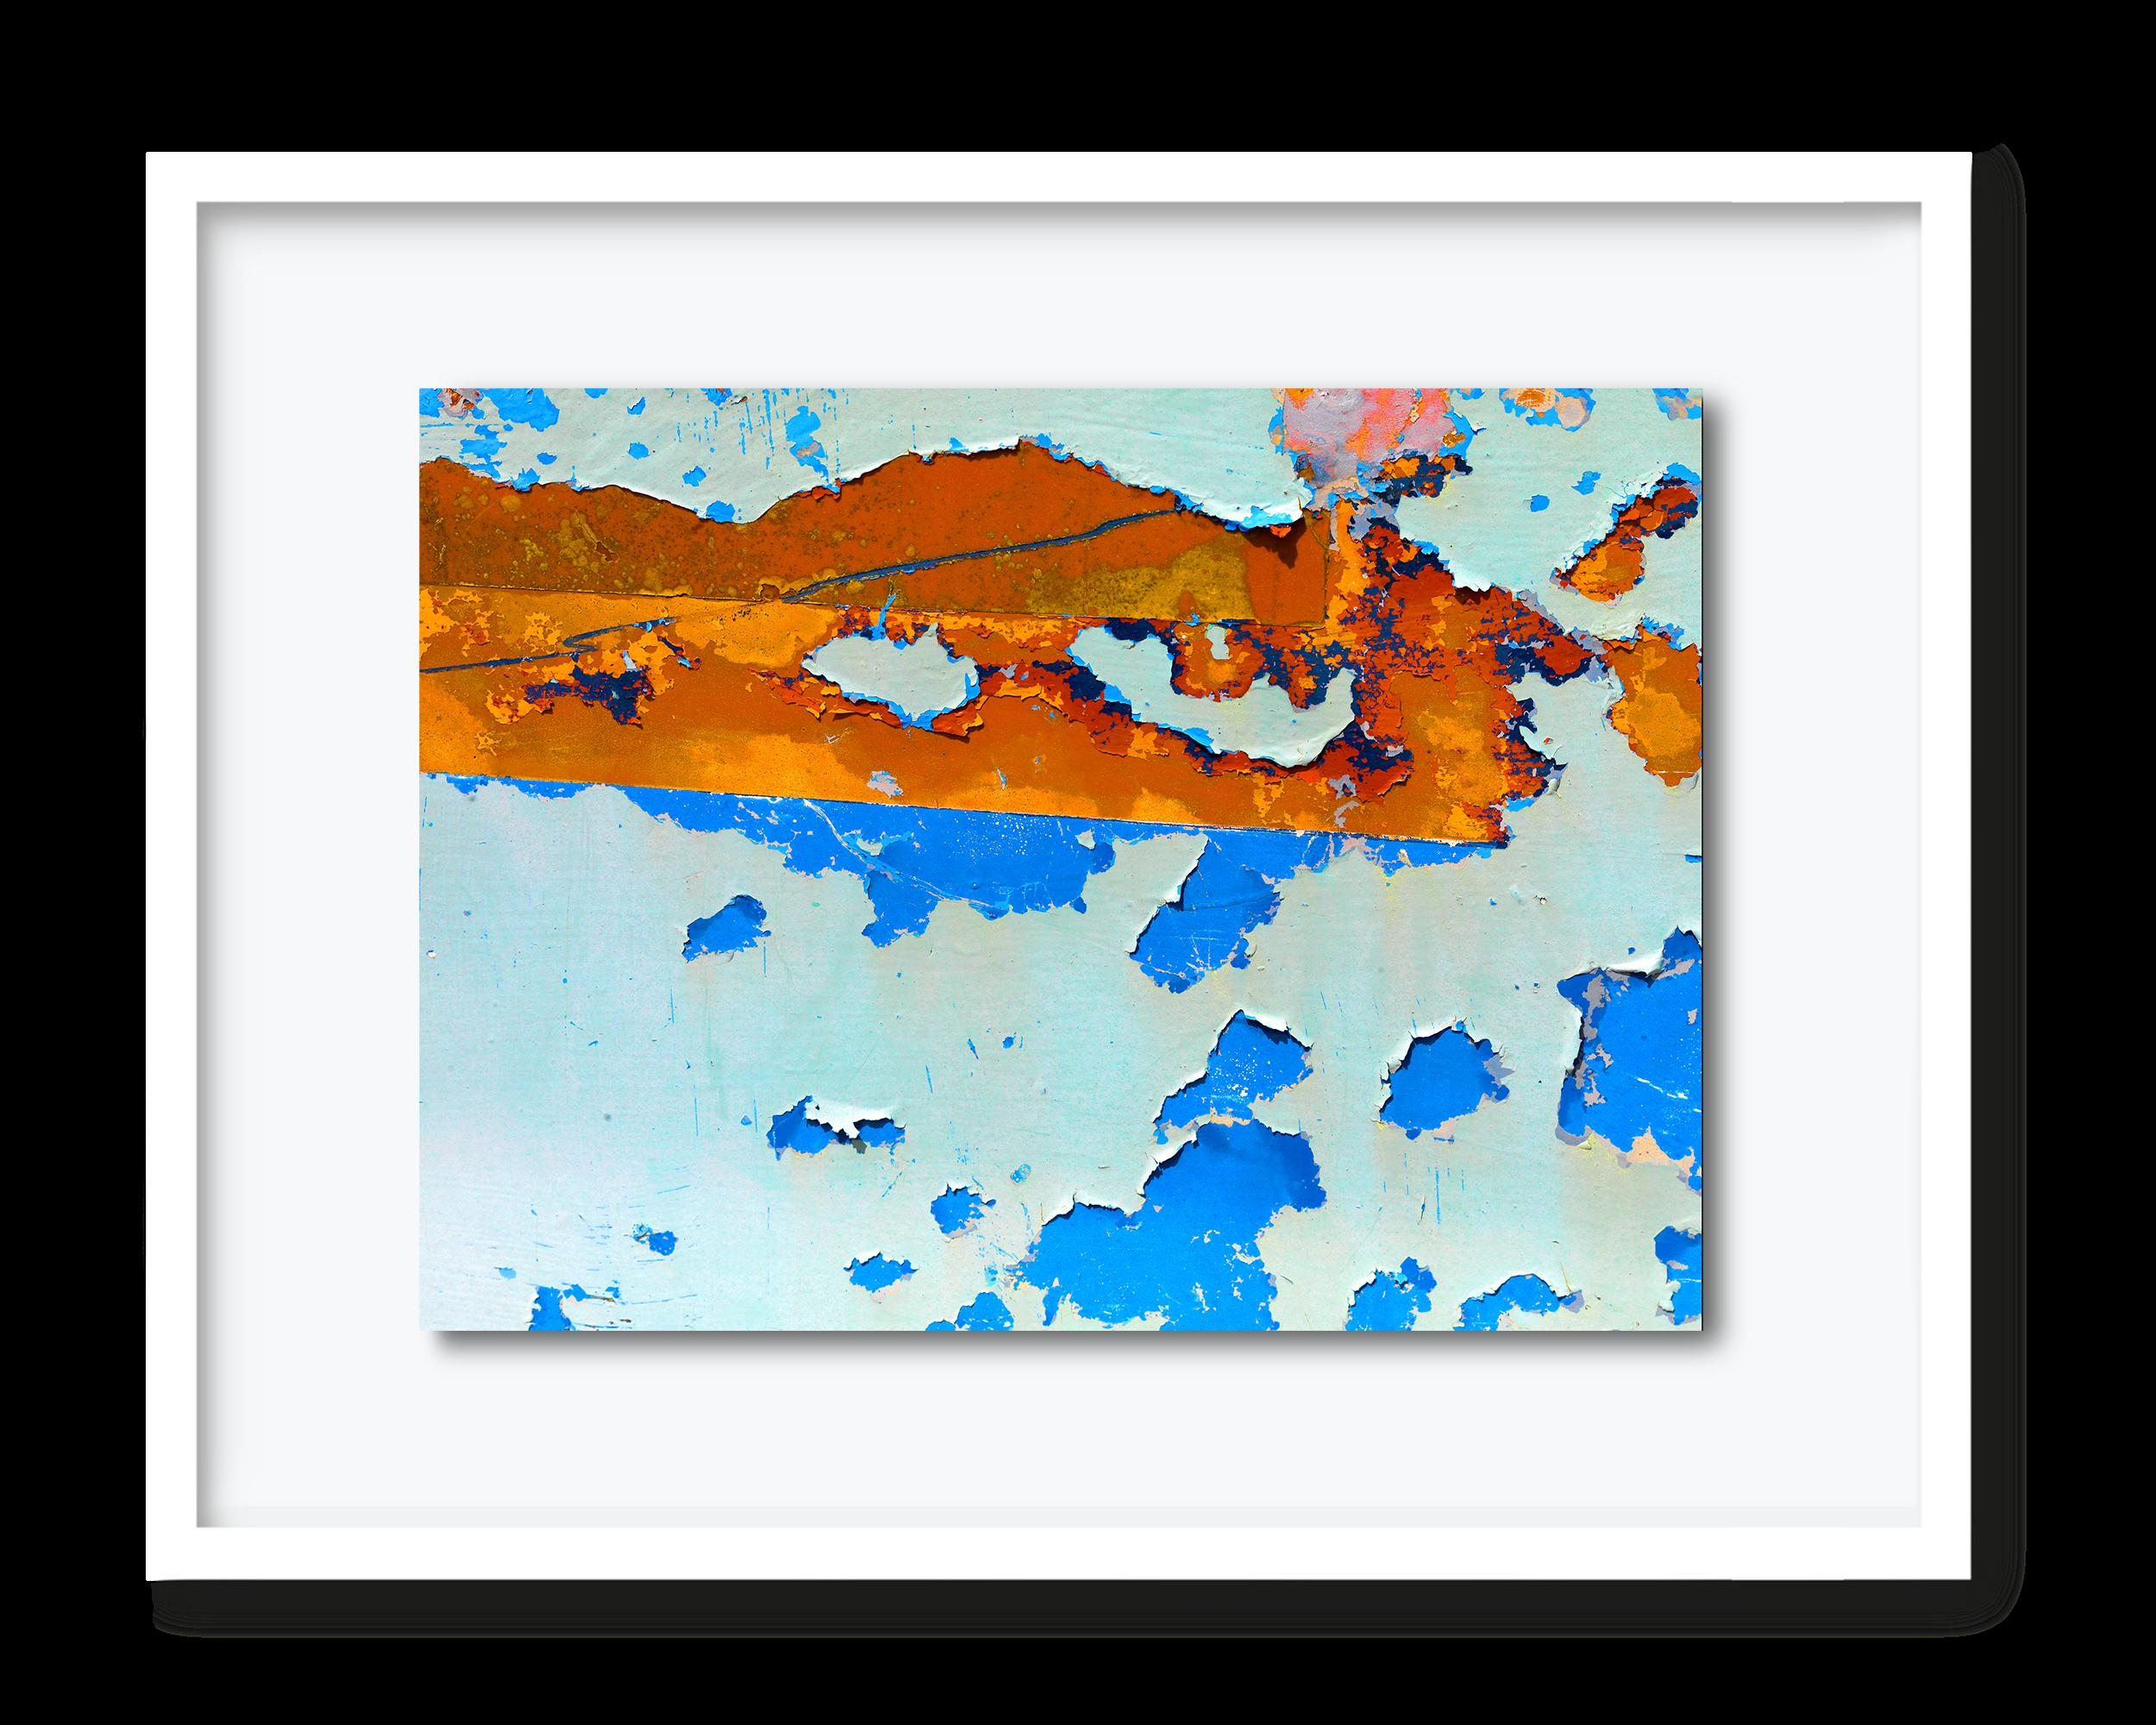 40.david-pearce-peeling-paint2.png